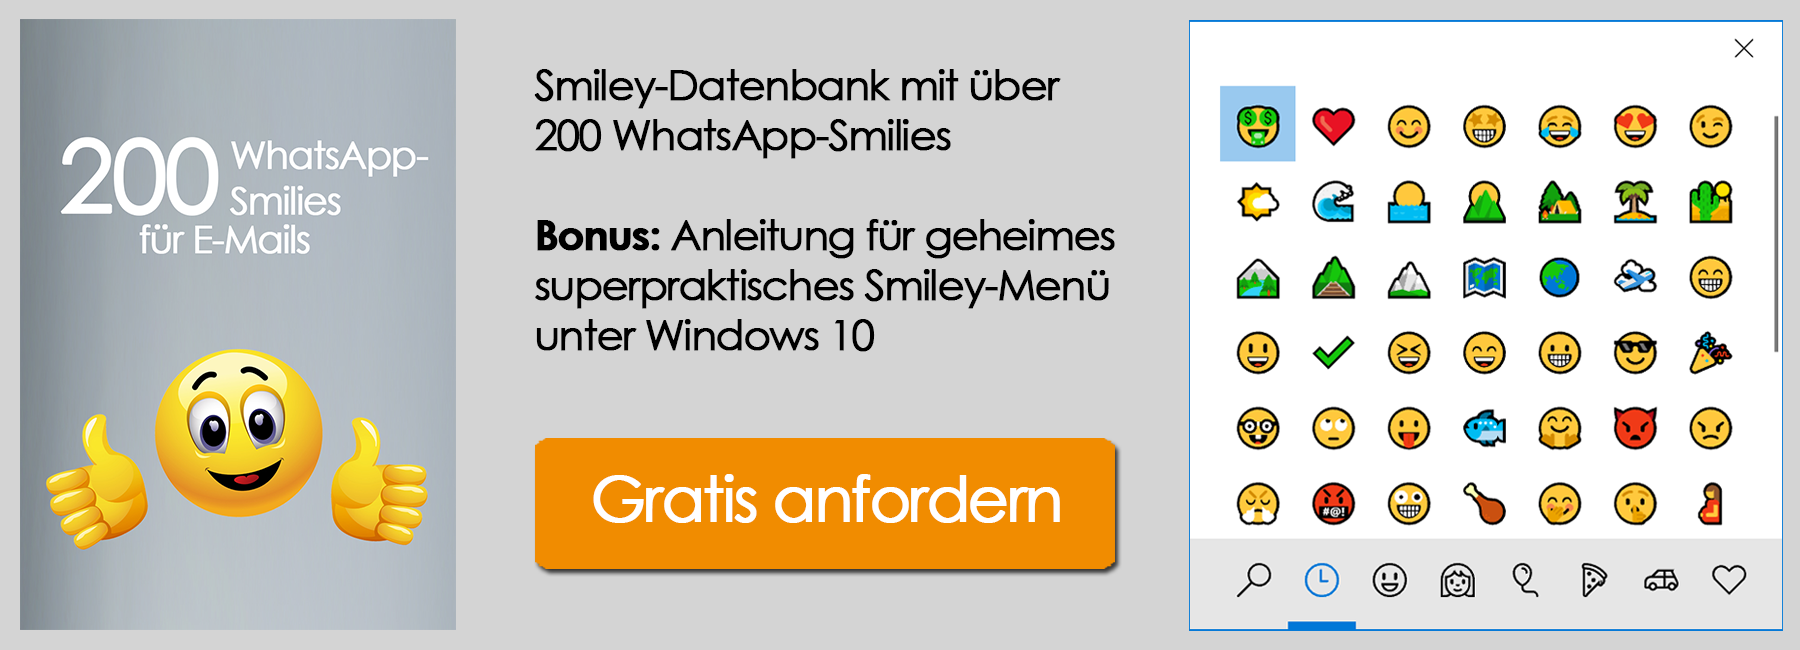 Tastatur computer smileys Office 365